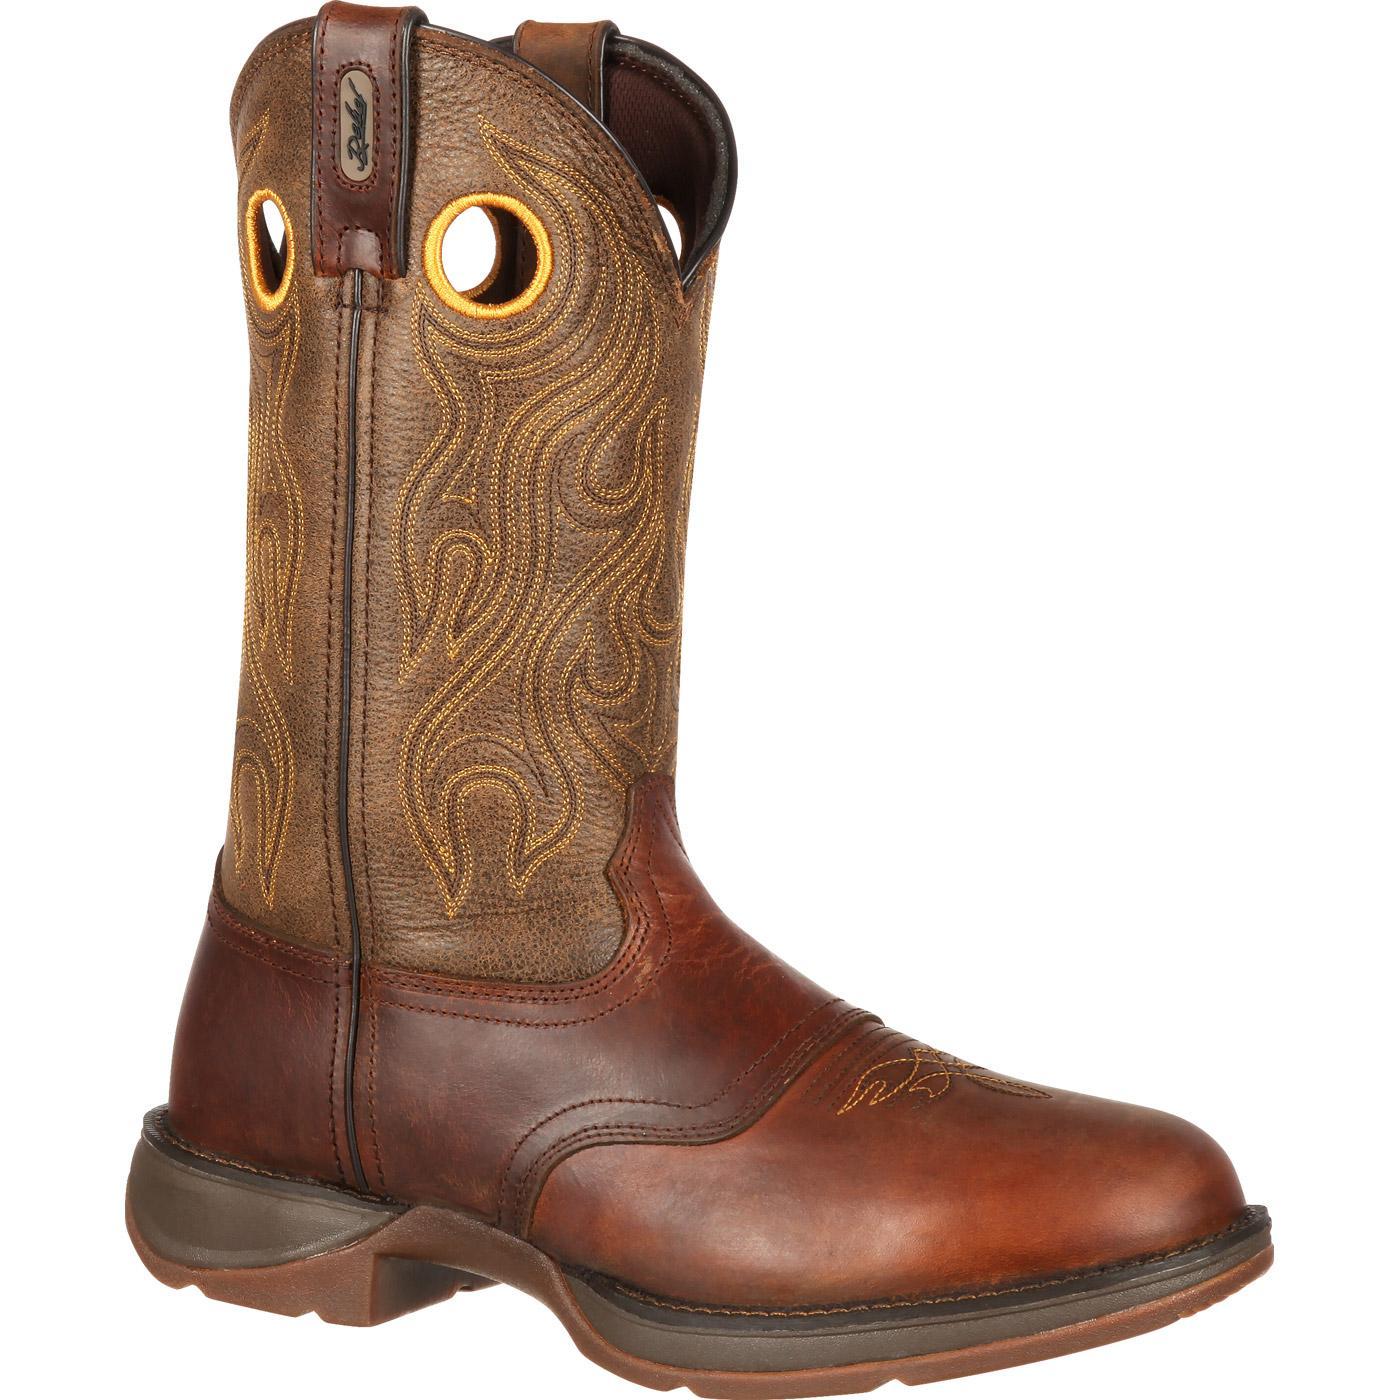 Rebel by Durango Brown Saddle Western Boot large